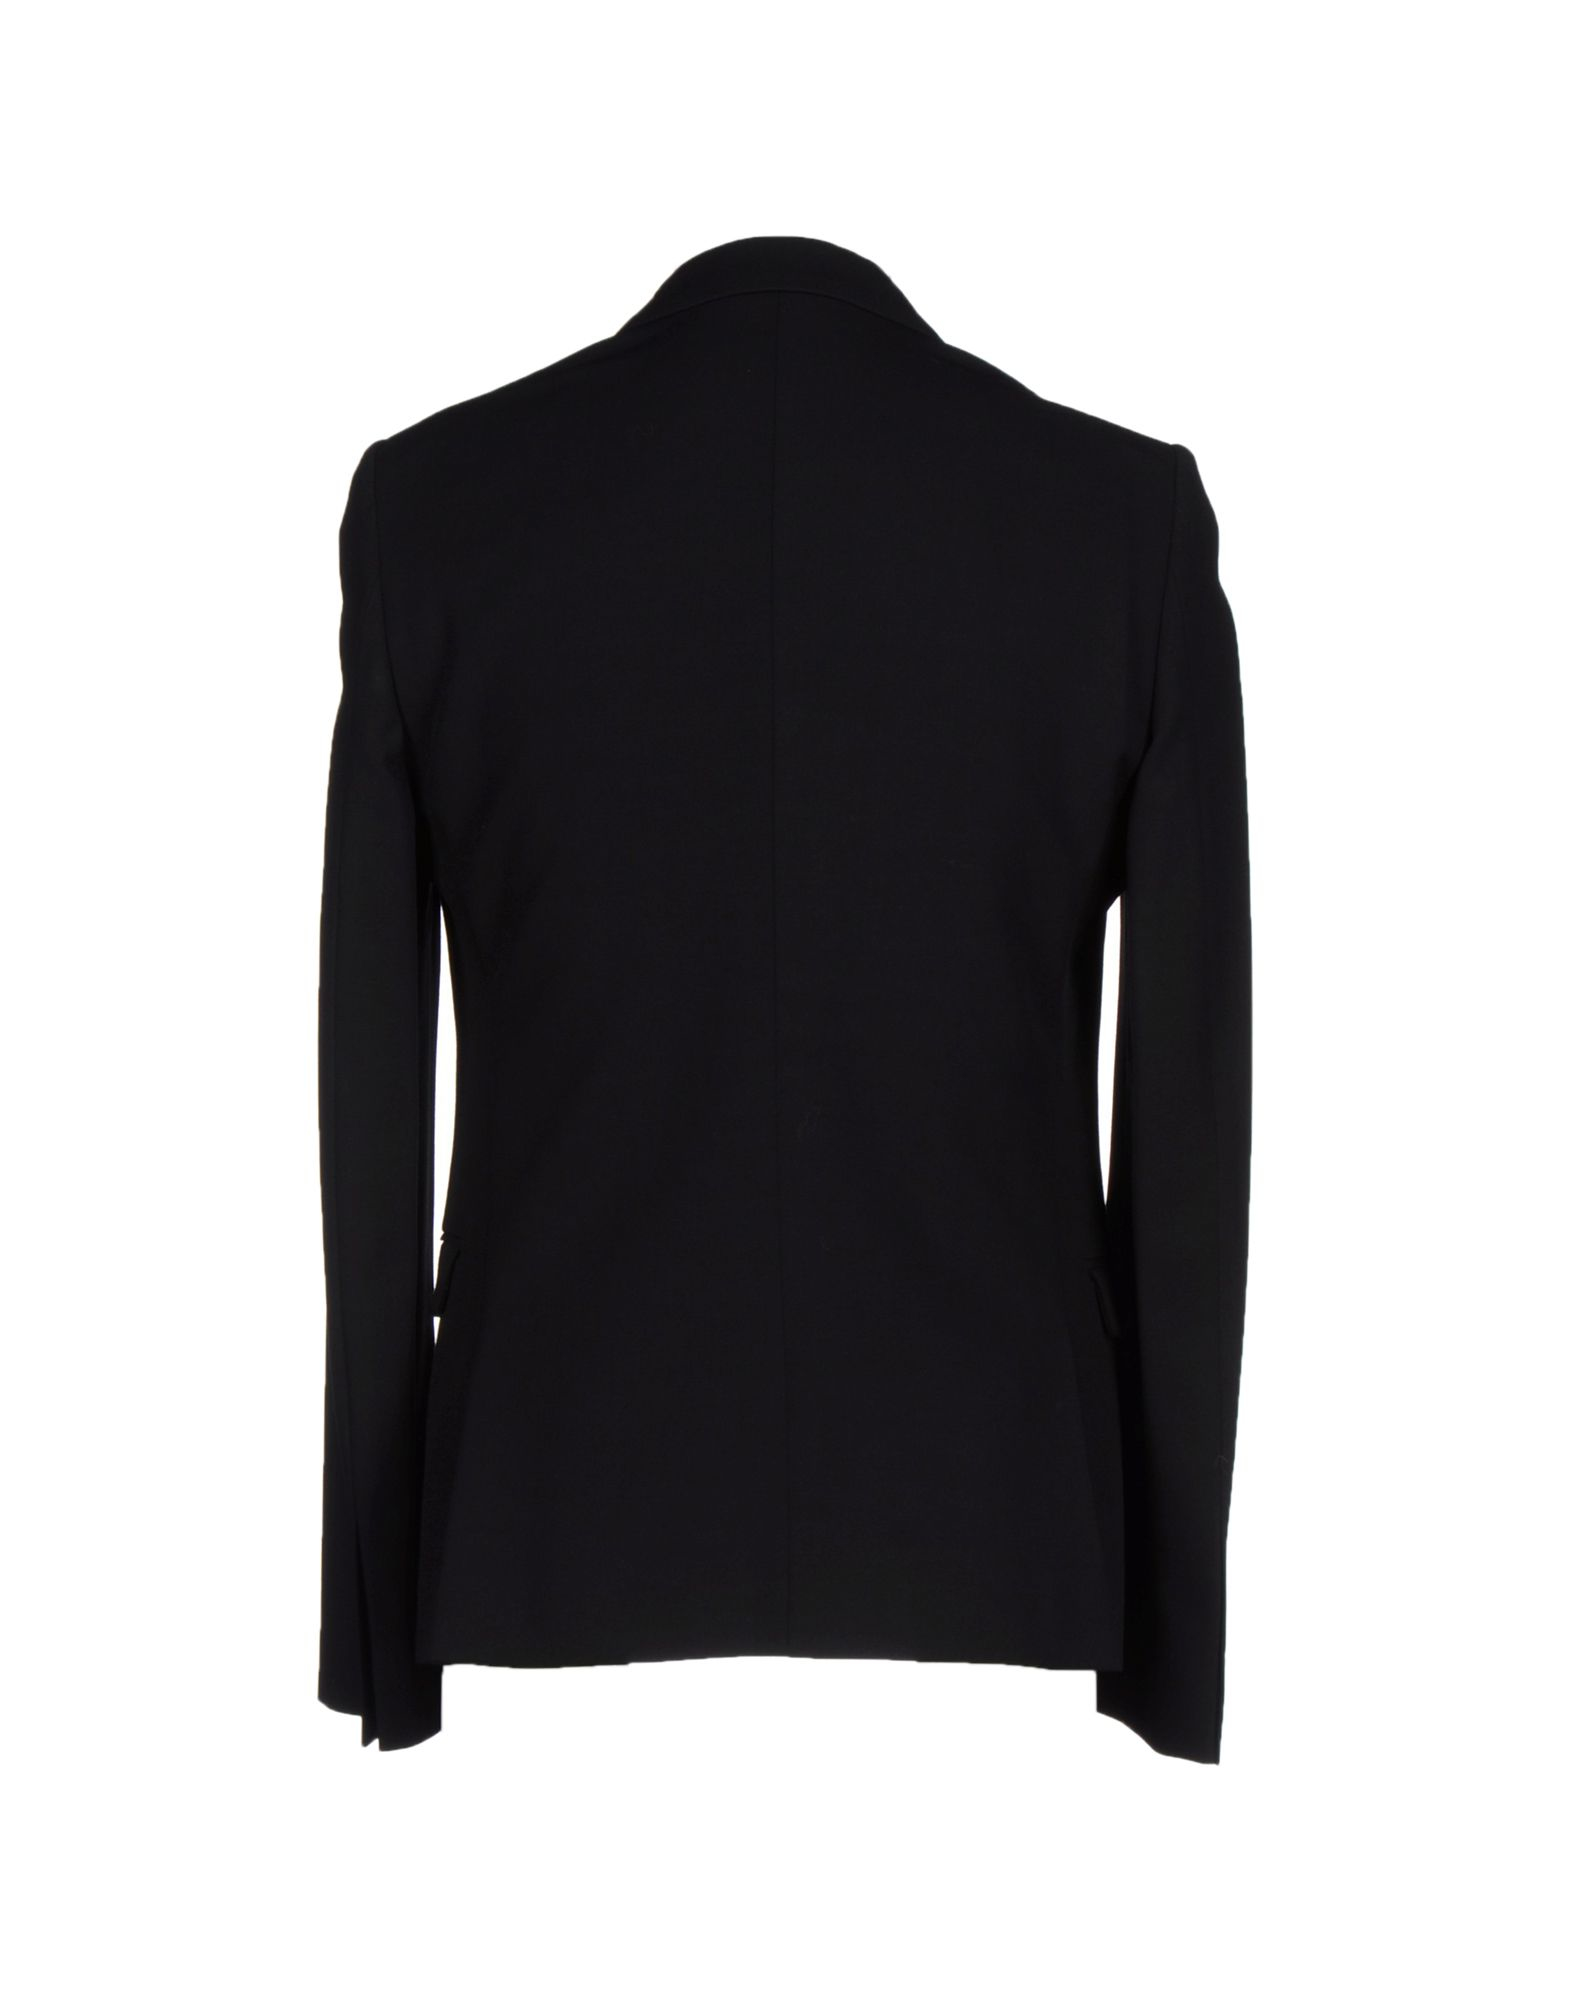 lyst patrizia pepe blazer in black for men. Black Bedroom Furniture Sets. Home Design Ideas